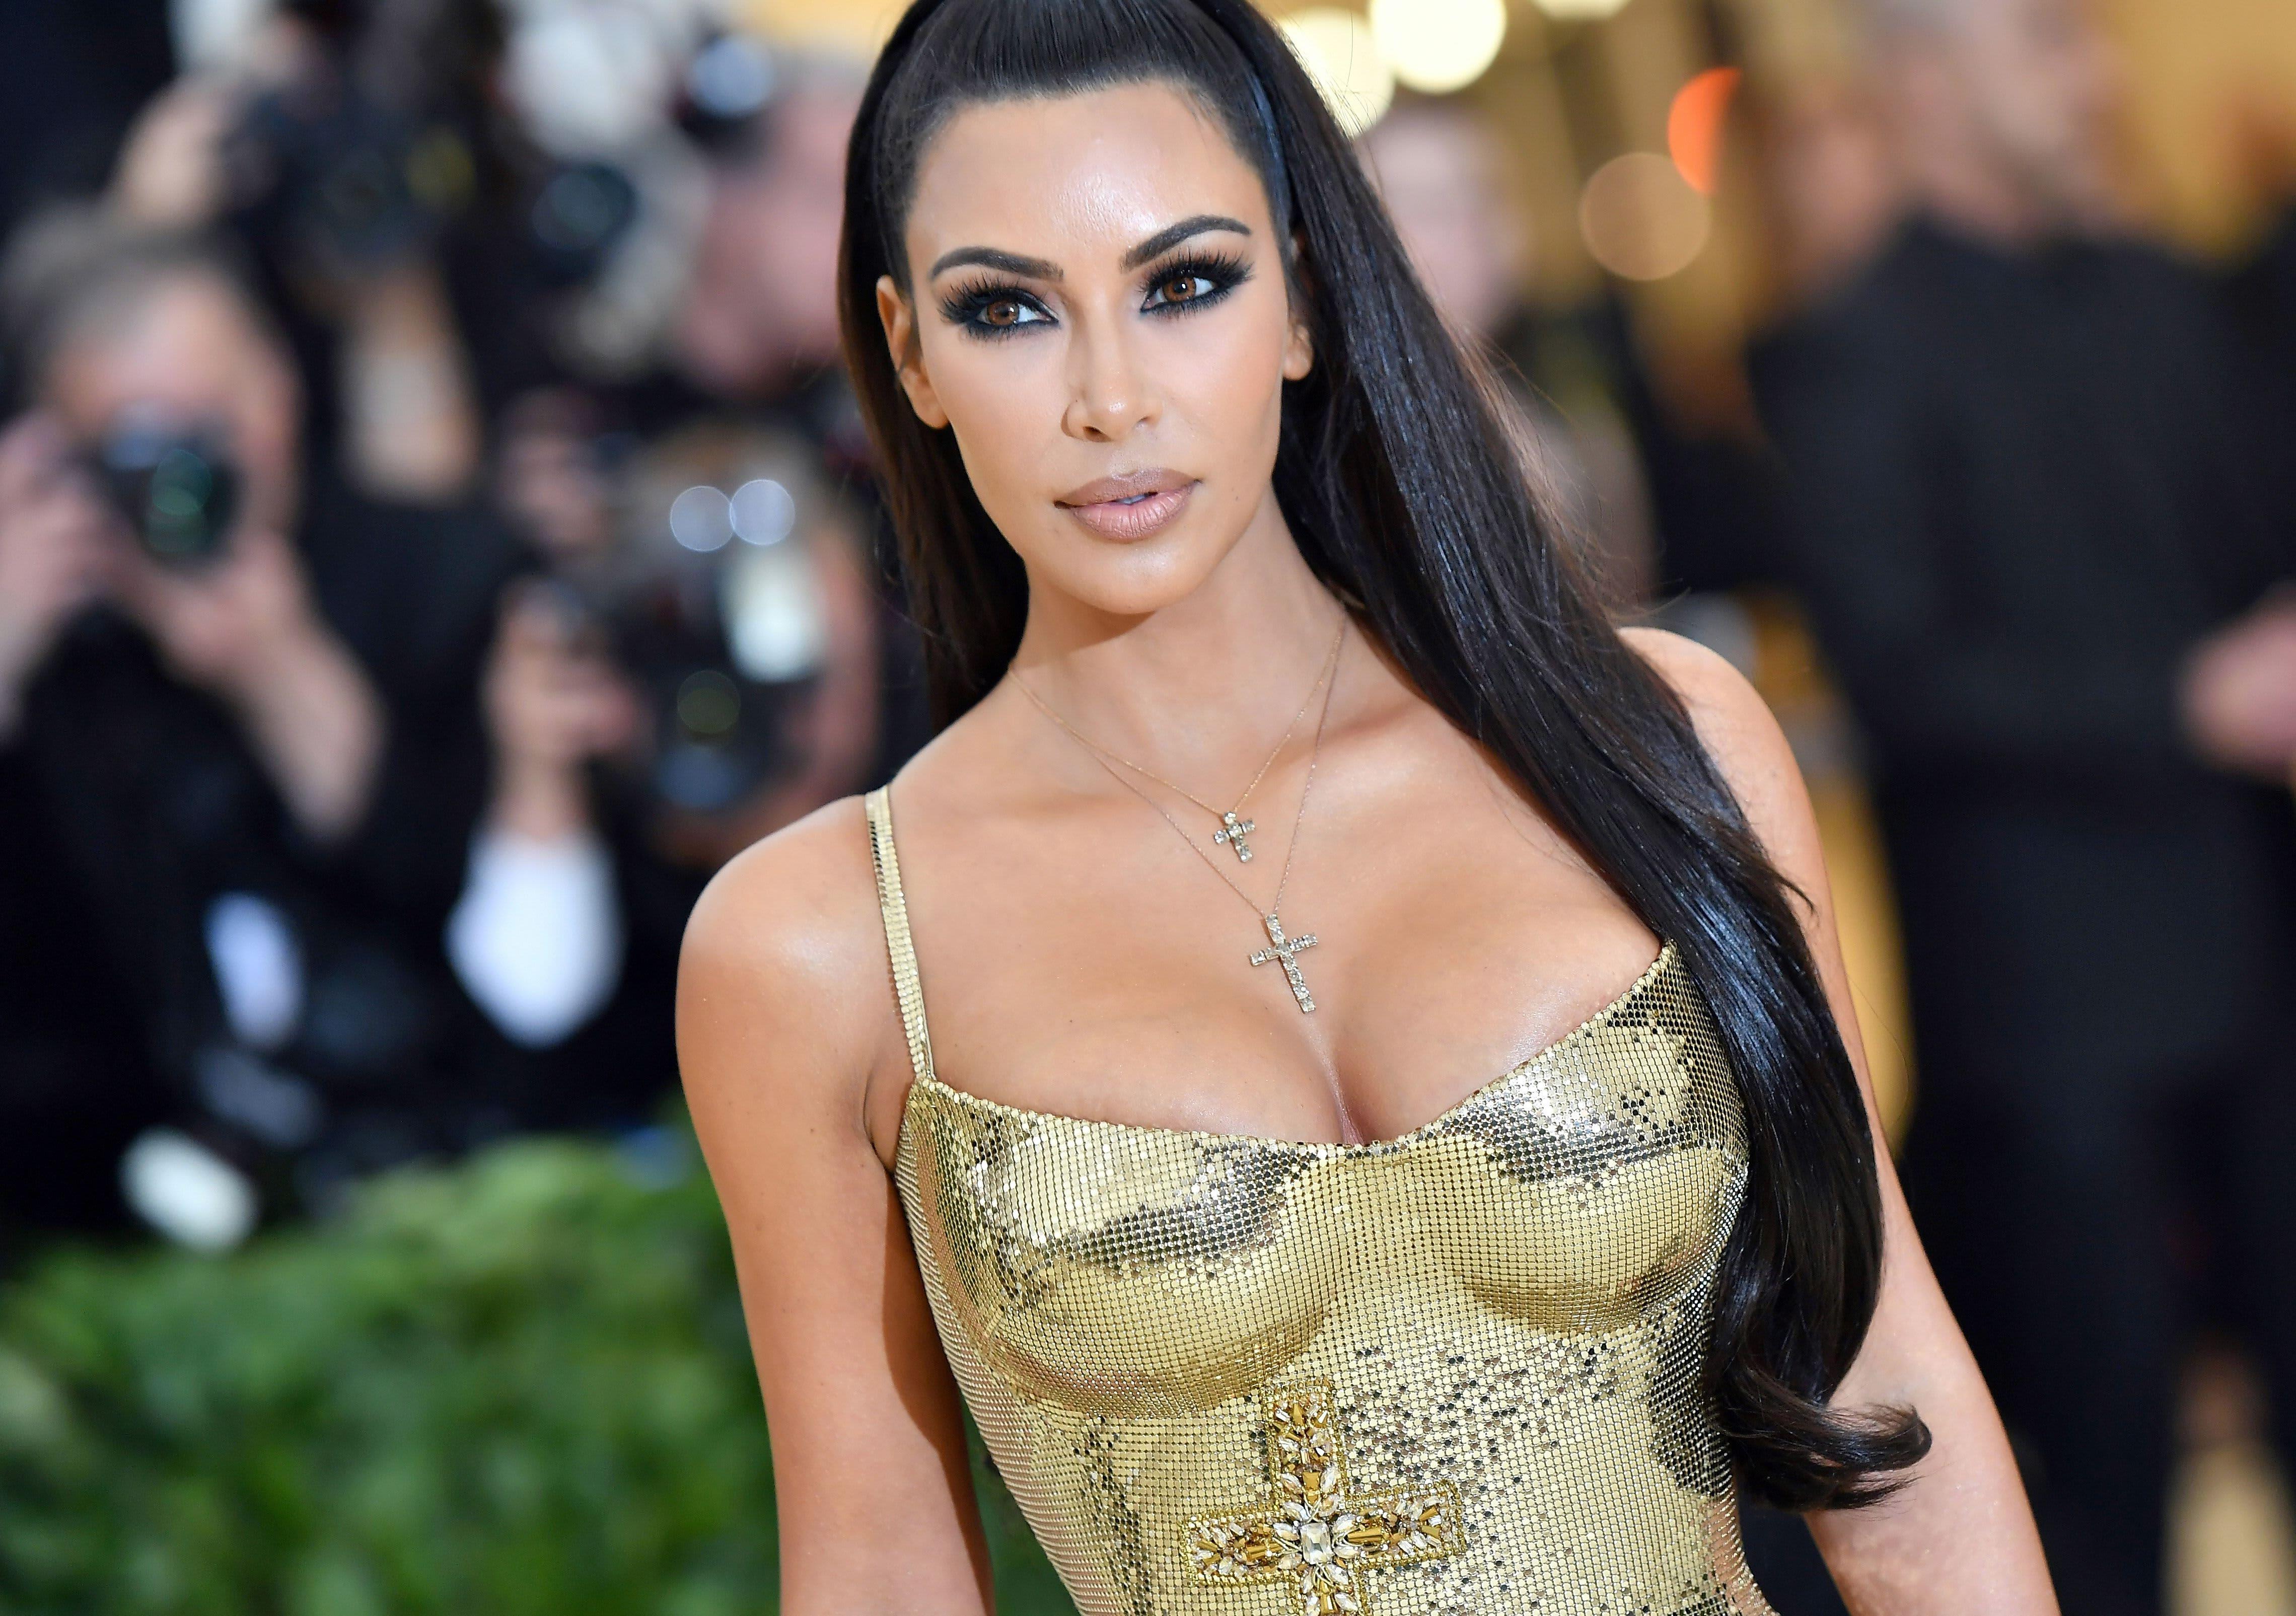 Kim Kardashian Is Renaming Her Kimono Company After Causing Uproar